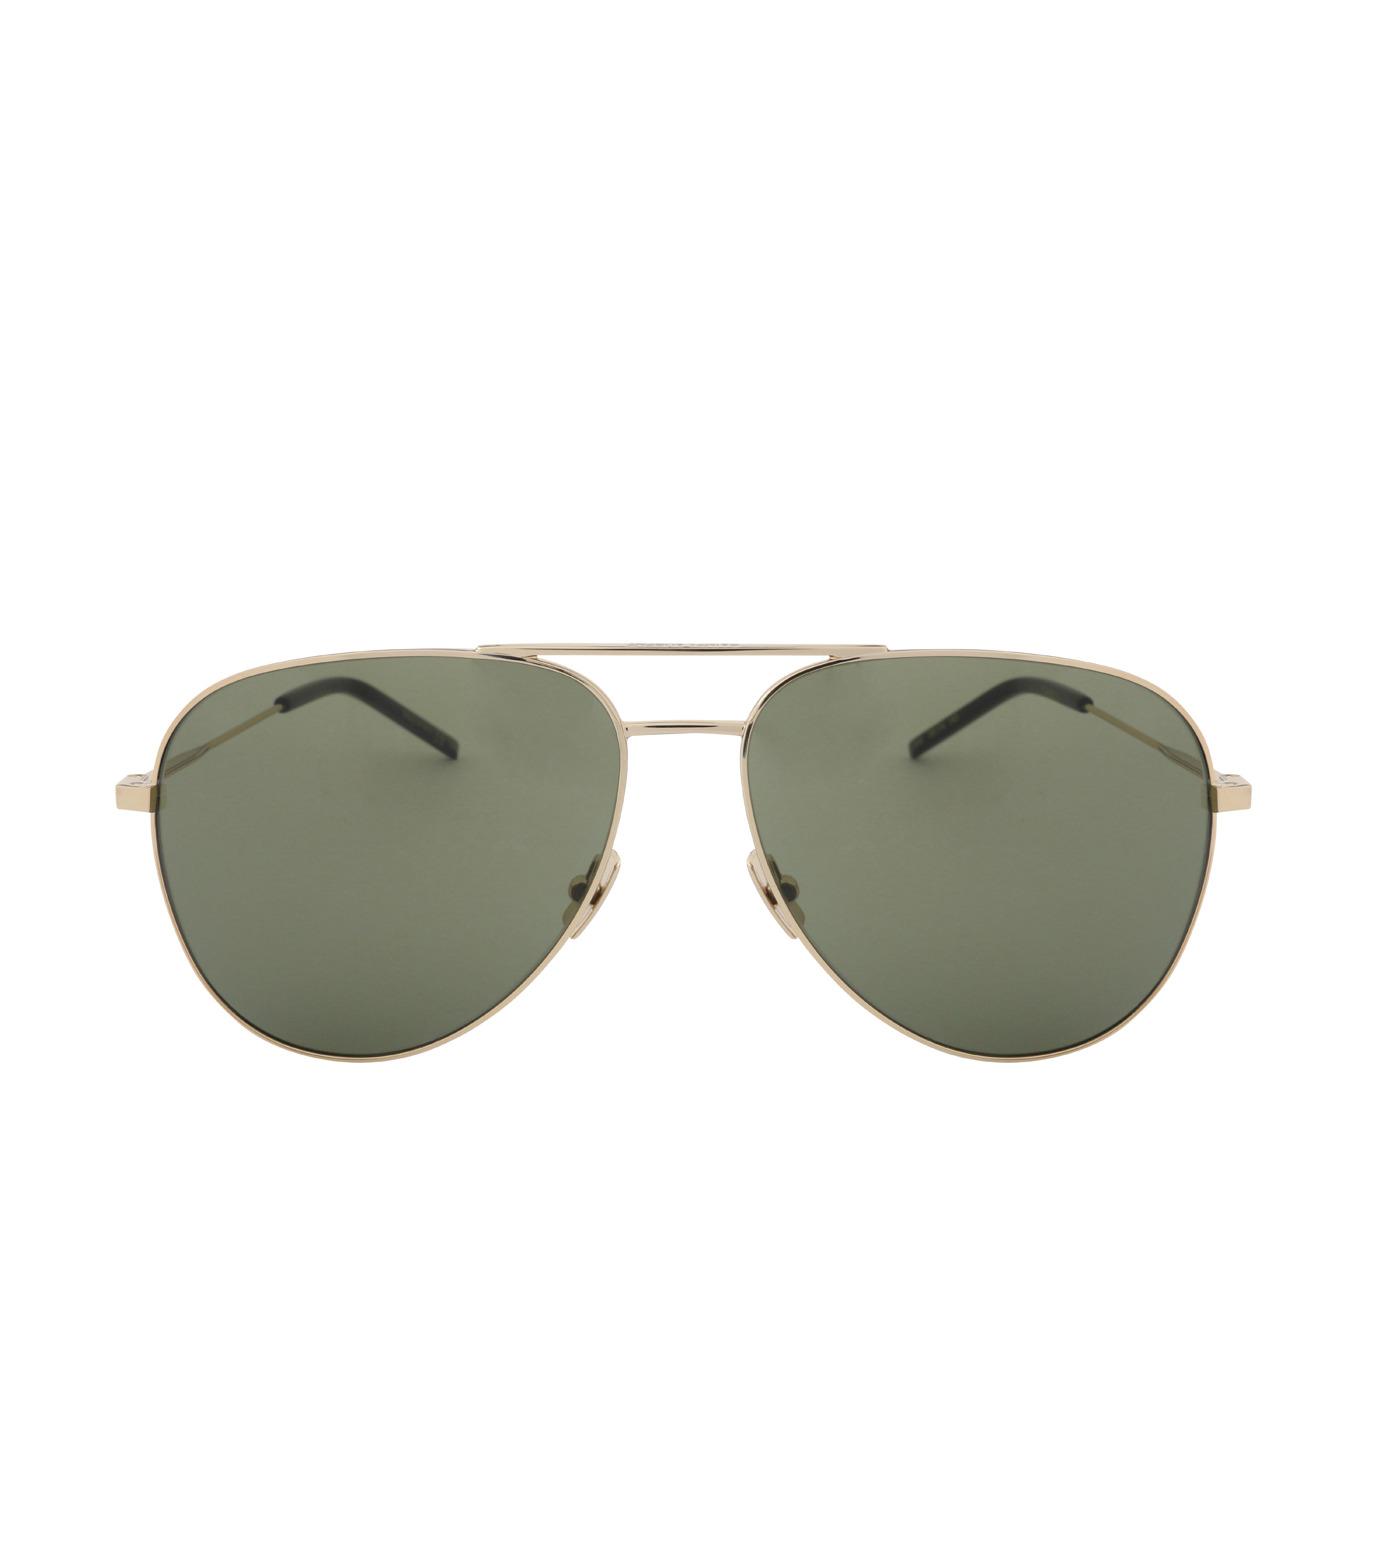 SAINT LAURENT(サンローラン)のTeardrop-GOLD(アイウェア/eyewear)-419695-Y9910-2 拡大詳細画像3